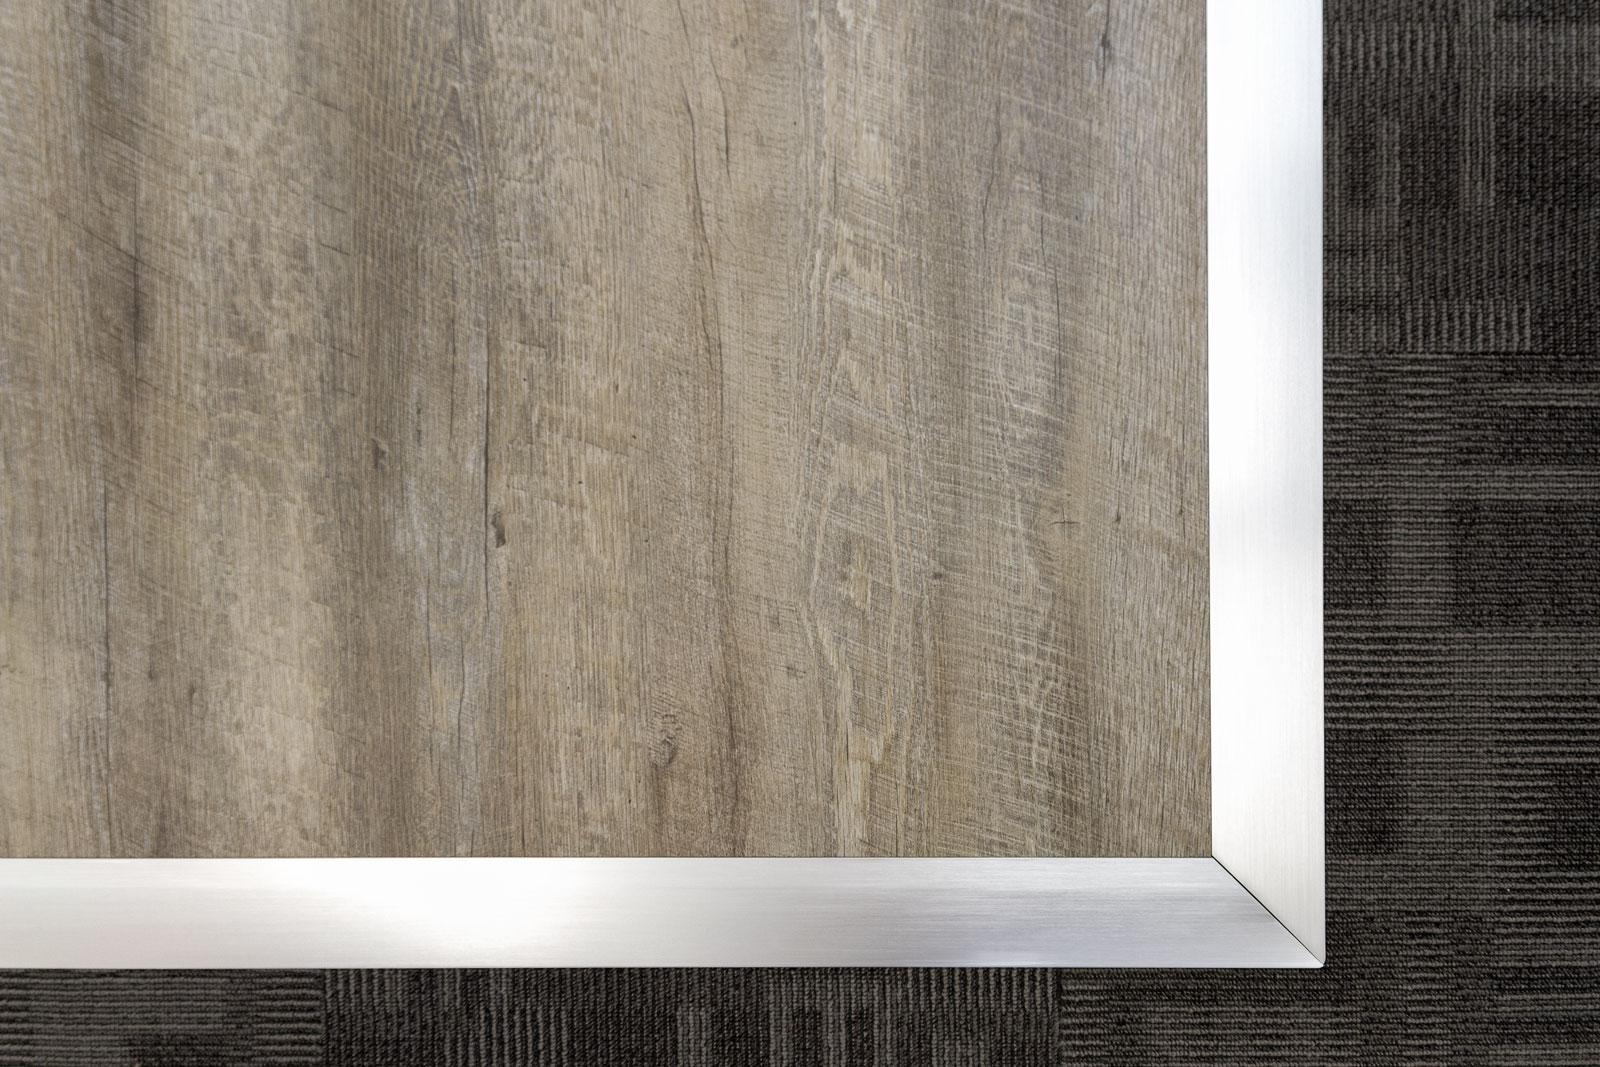 Silver style Aluminum edging on Smoked Oak.